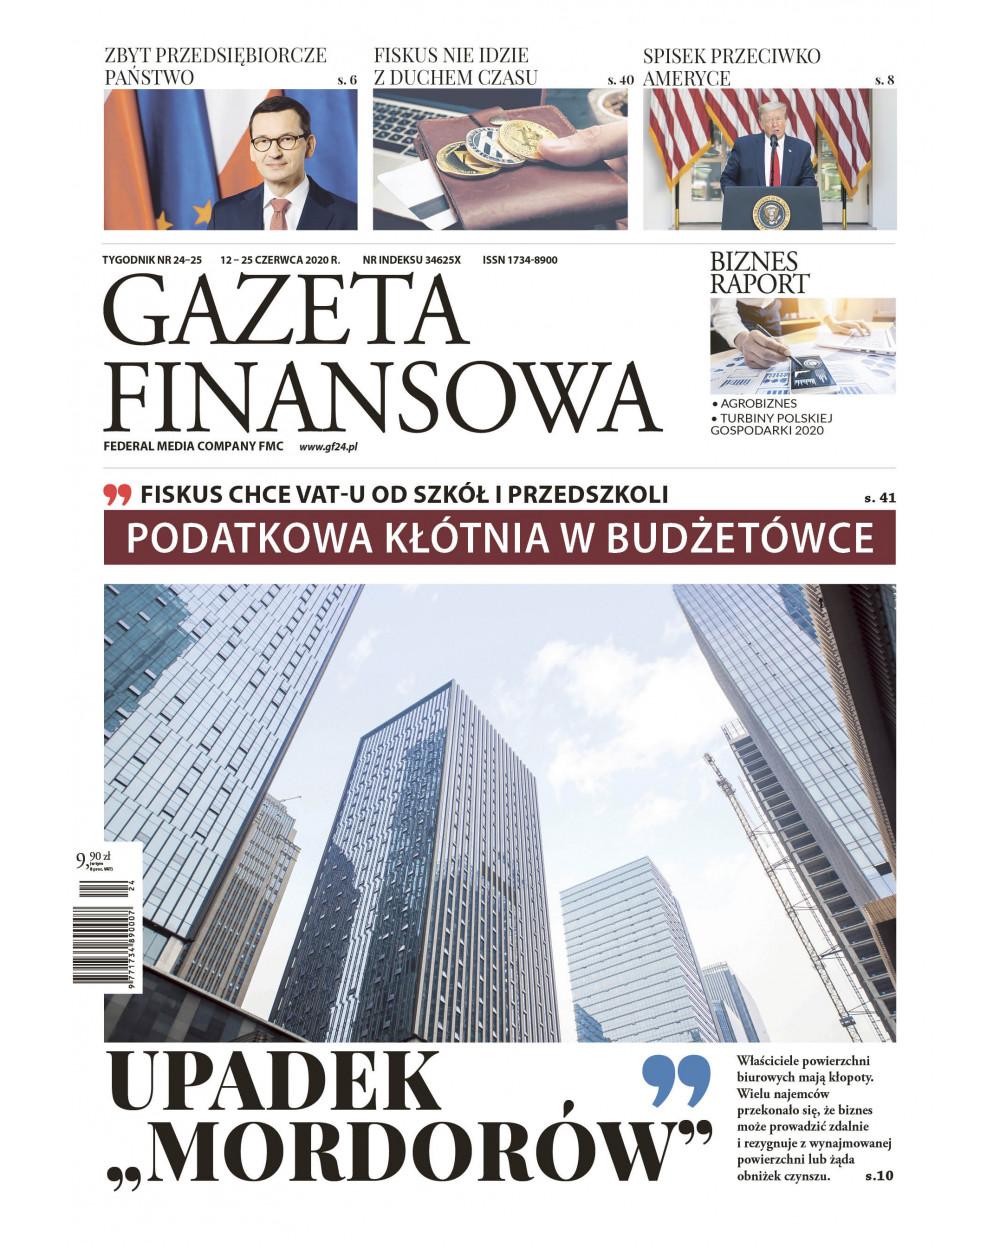 Gazeta Finansowa 24-25/2020